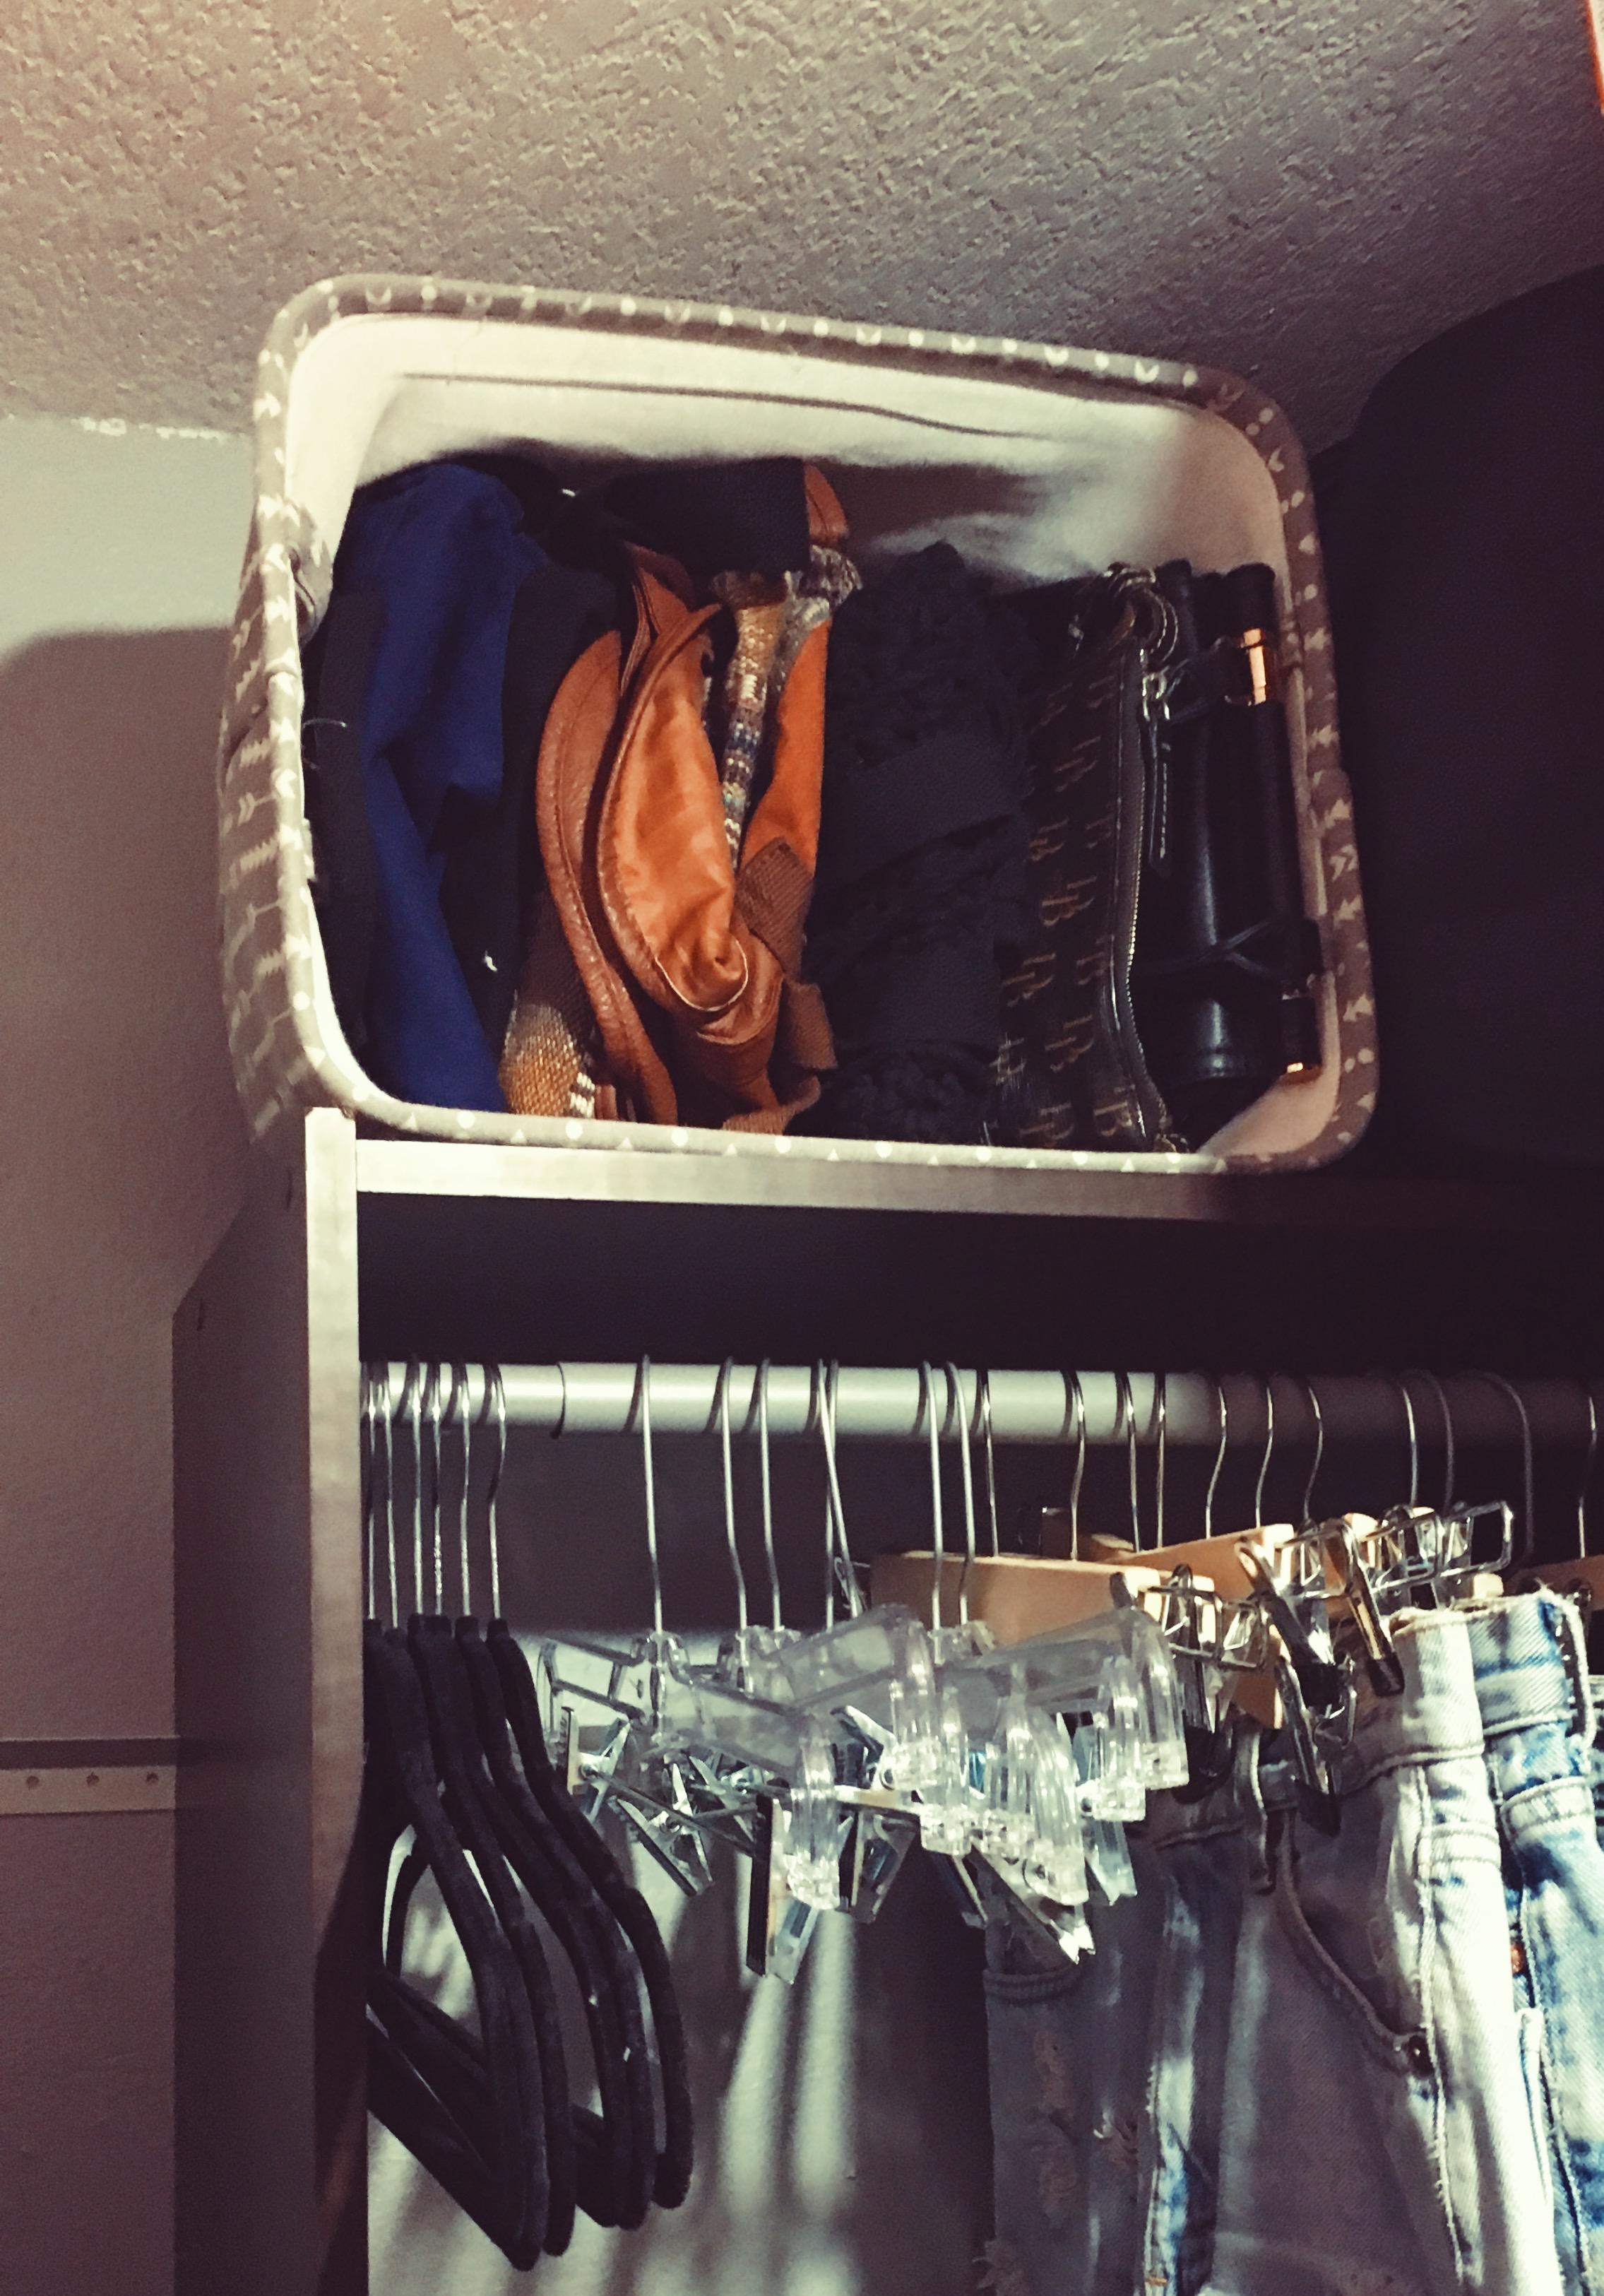 purses in a bin-purse storage-bag storage-closet organizing-wear who you are